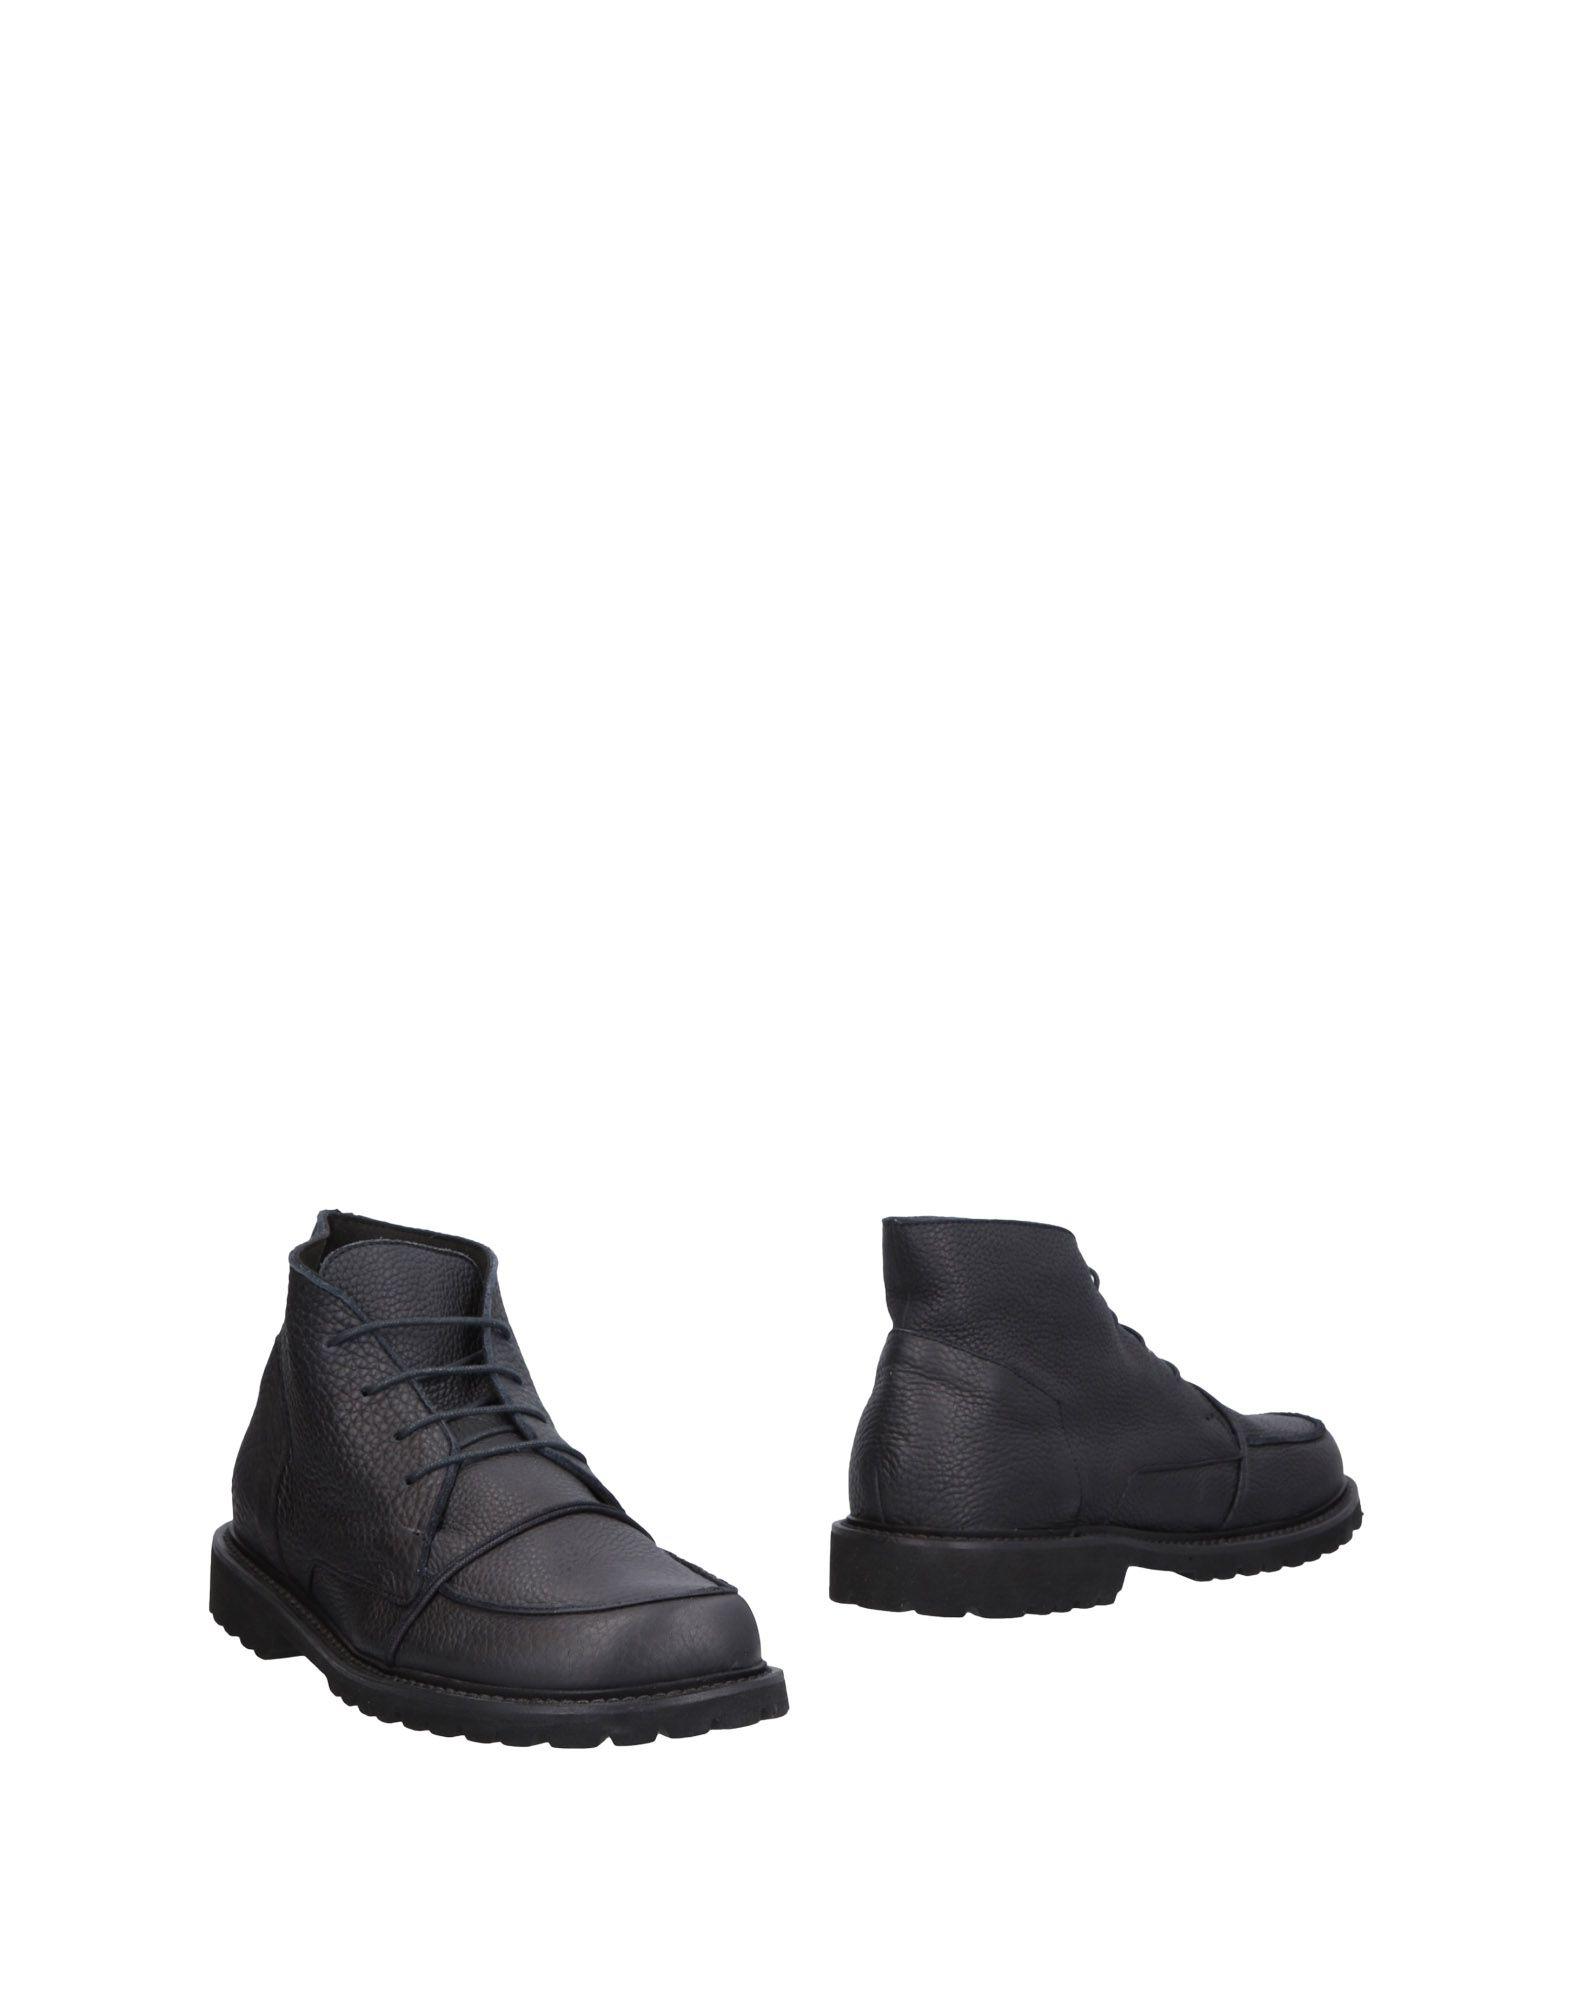 PETER NON Полусапоги и высокие ботинки peter non мюлес и сабо